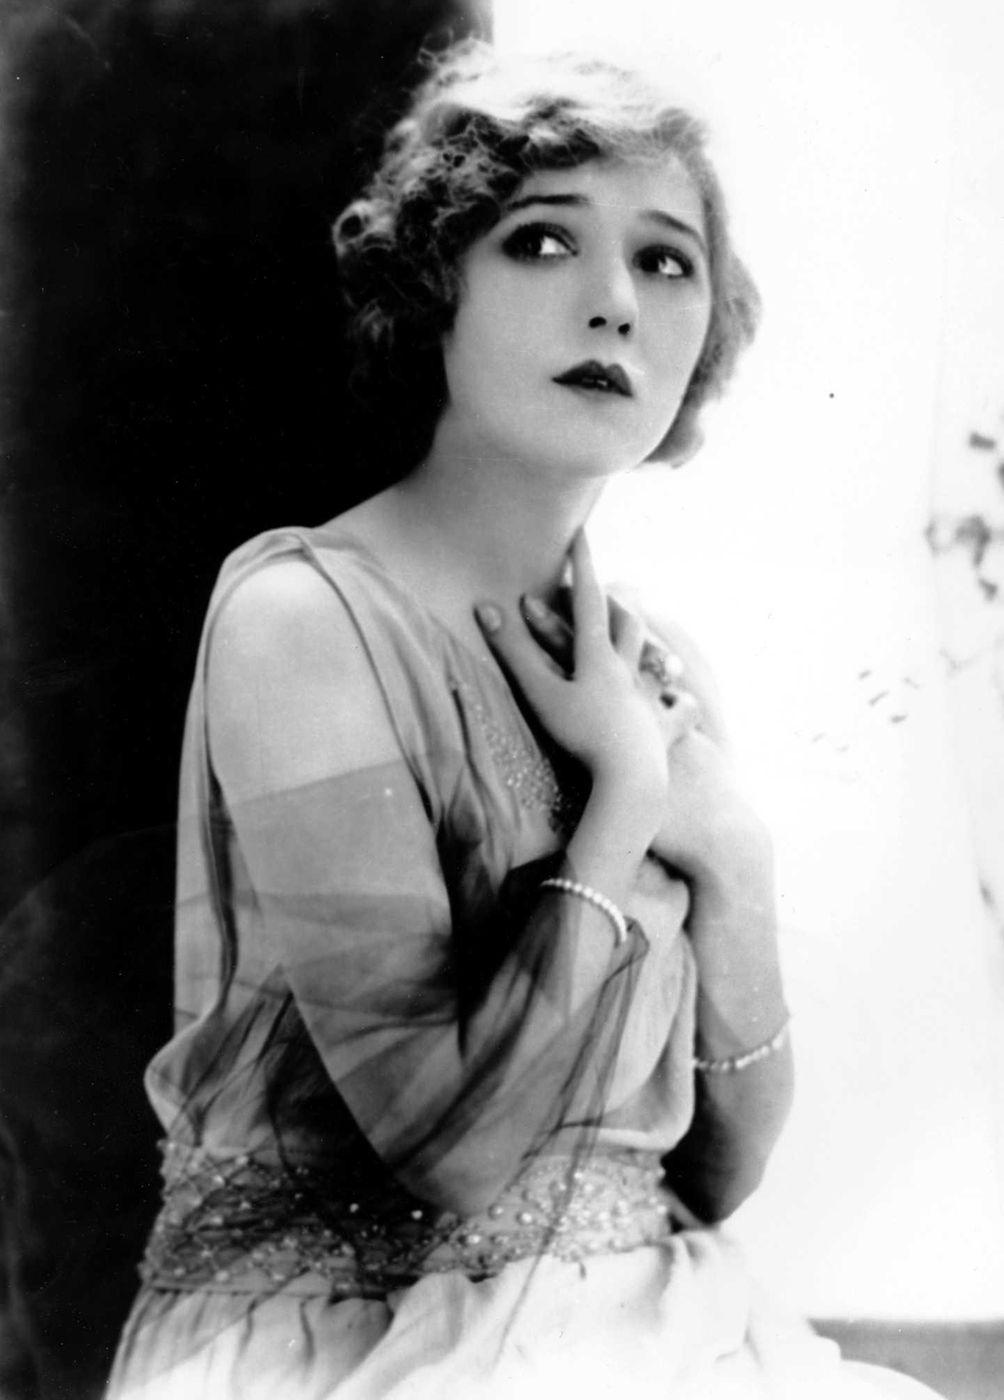 1928/29 - Mary Pickford -